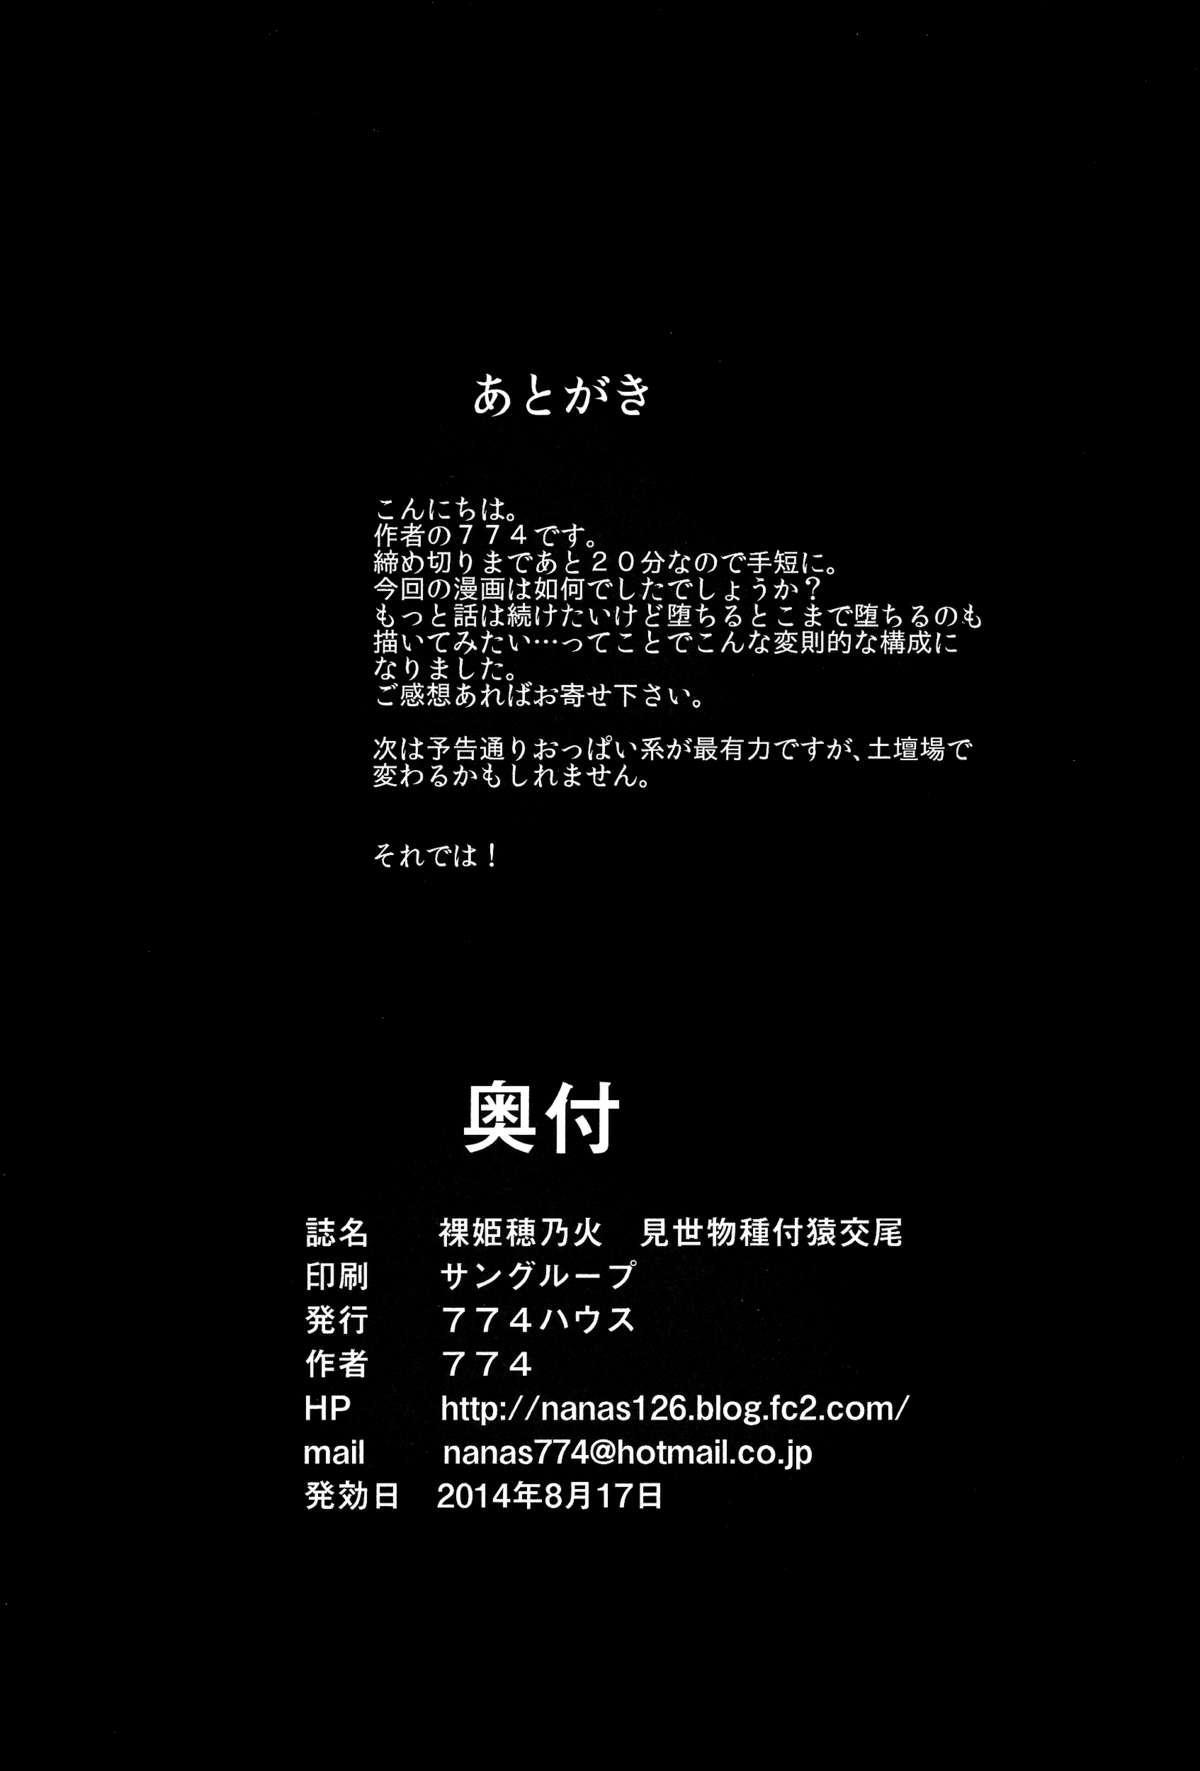 Hadakahime Honoka 2 Misemono Tanetsuke Saru Koubi | Naked Princess Honoka 2 - Mating Exhibition: Monkey Coitus 60